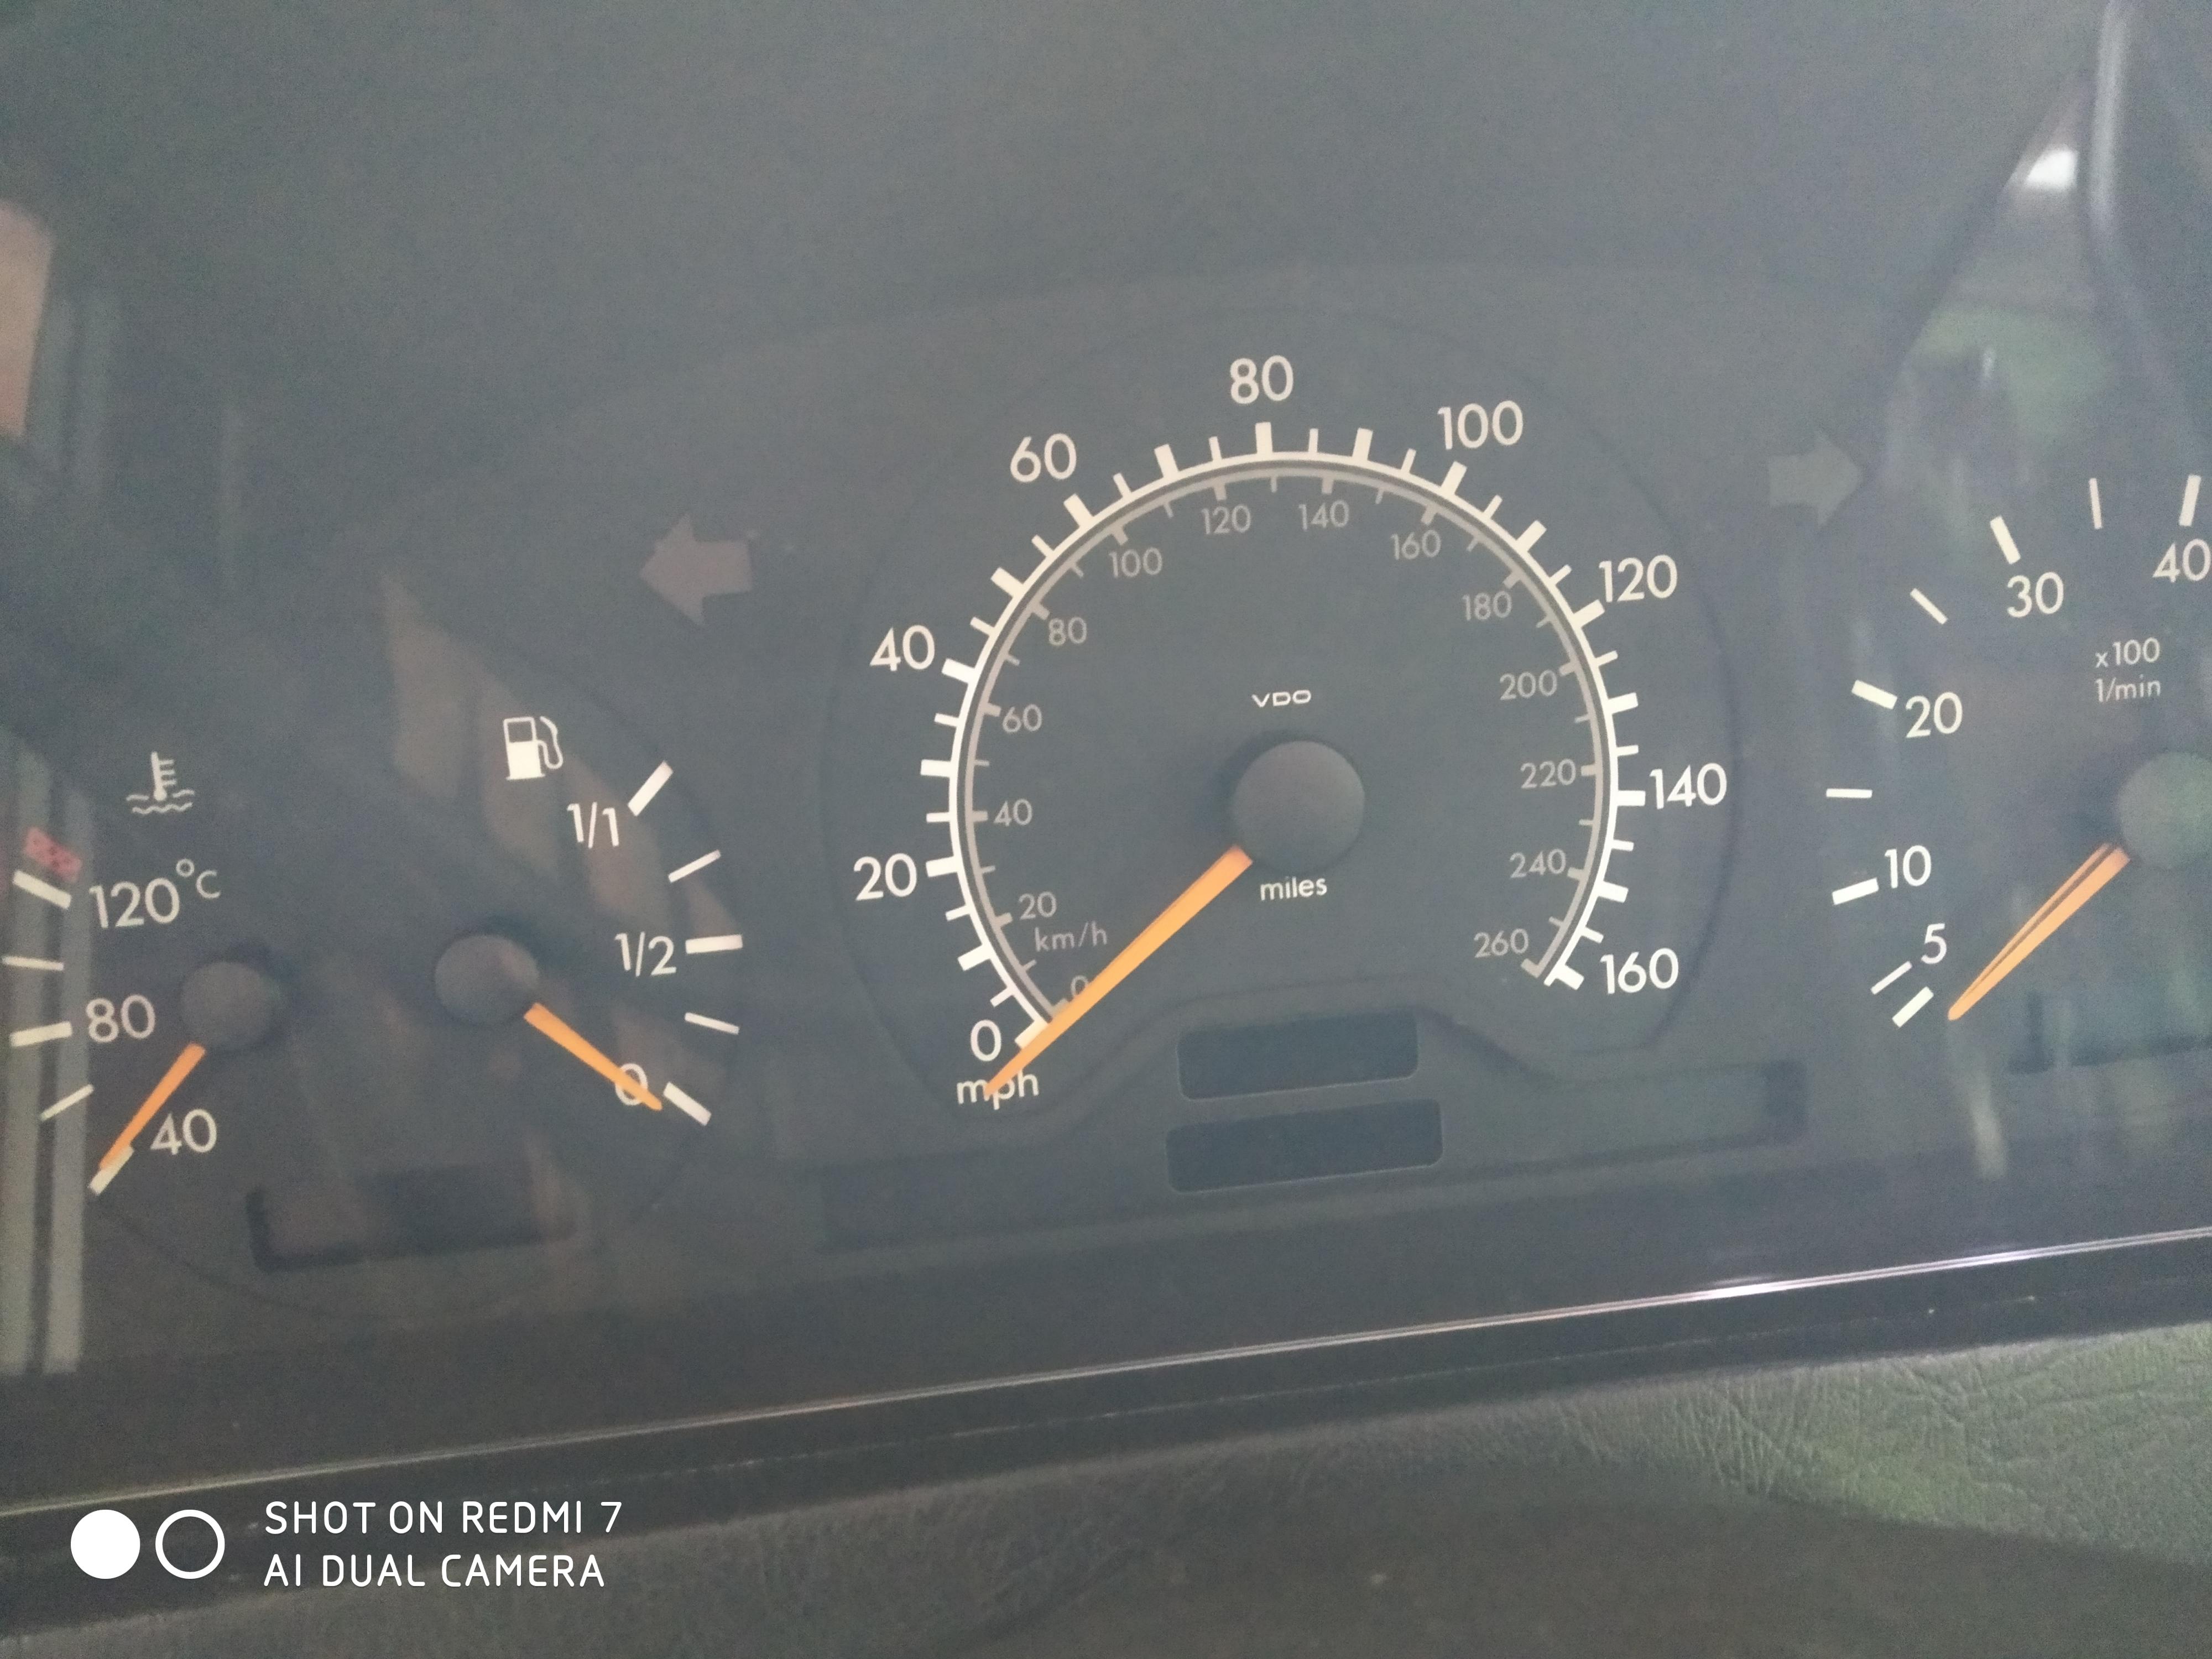 Mercedes-Benz C 230 2.3(lt) 2000 Second hand  $9850